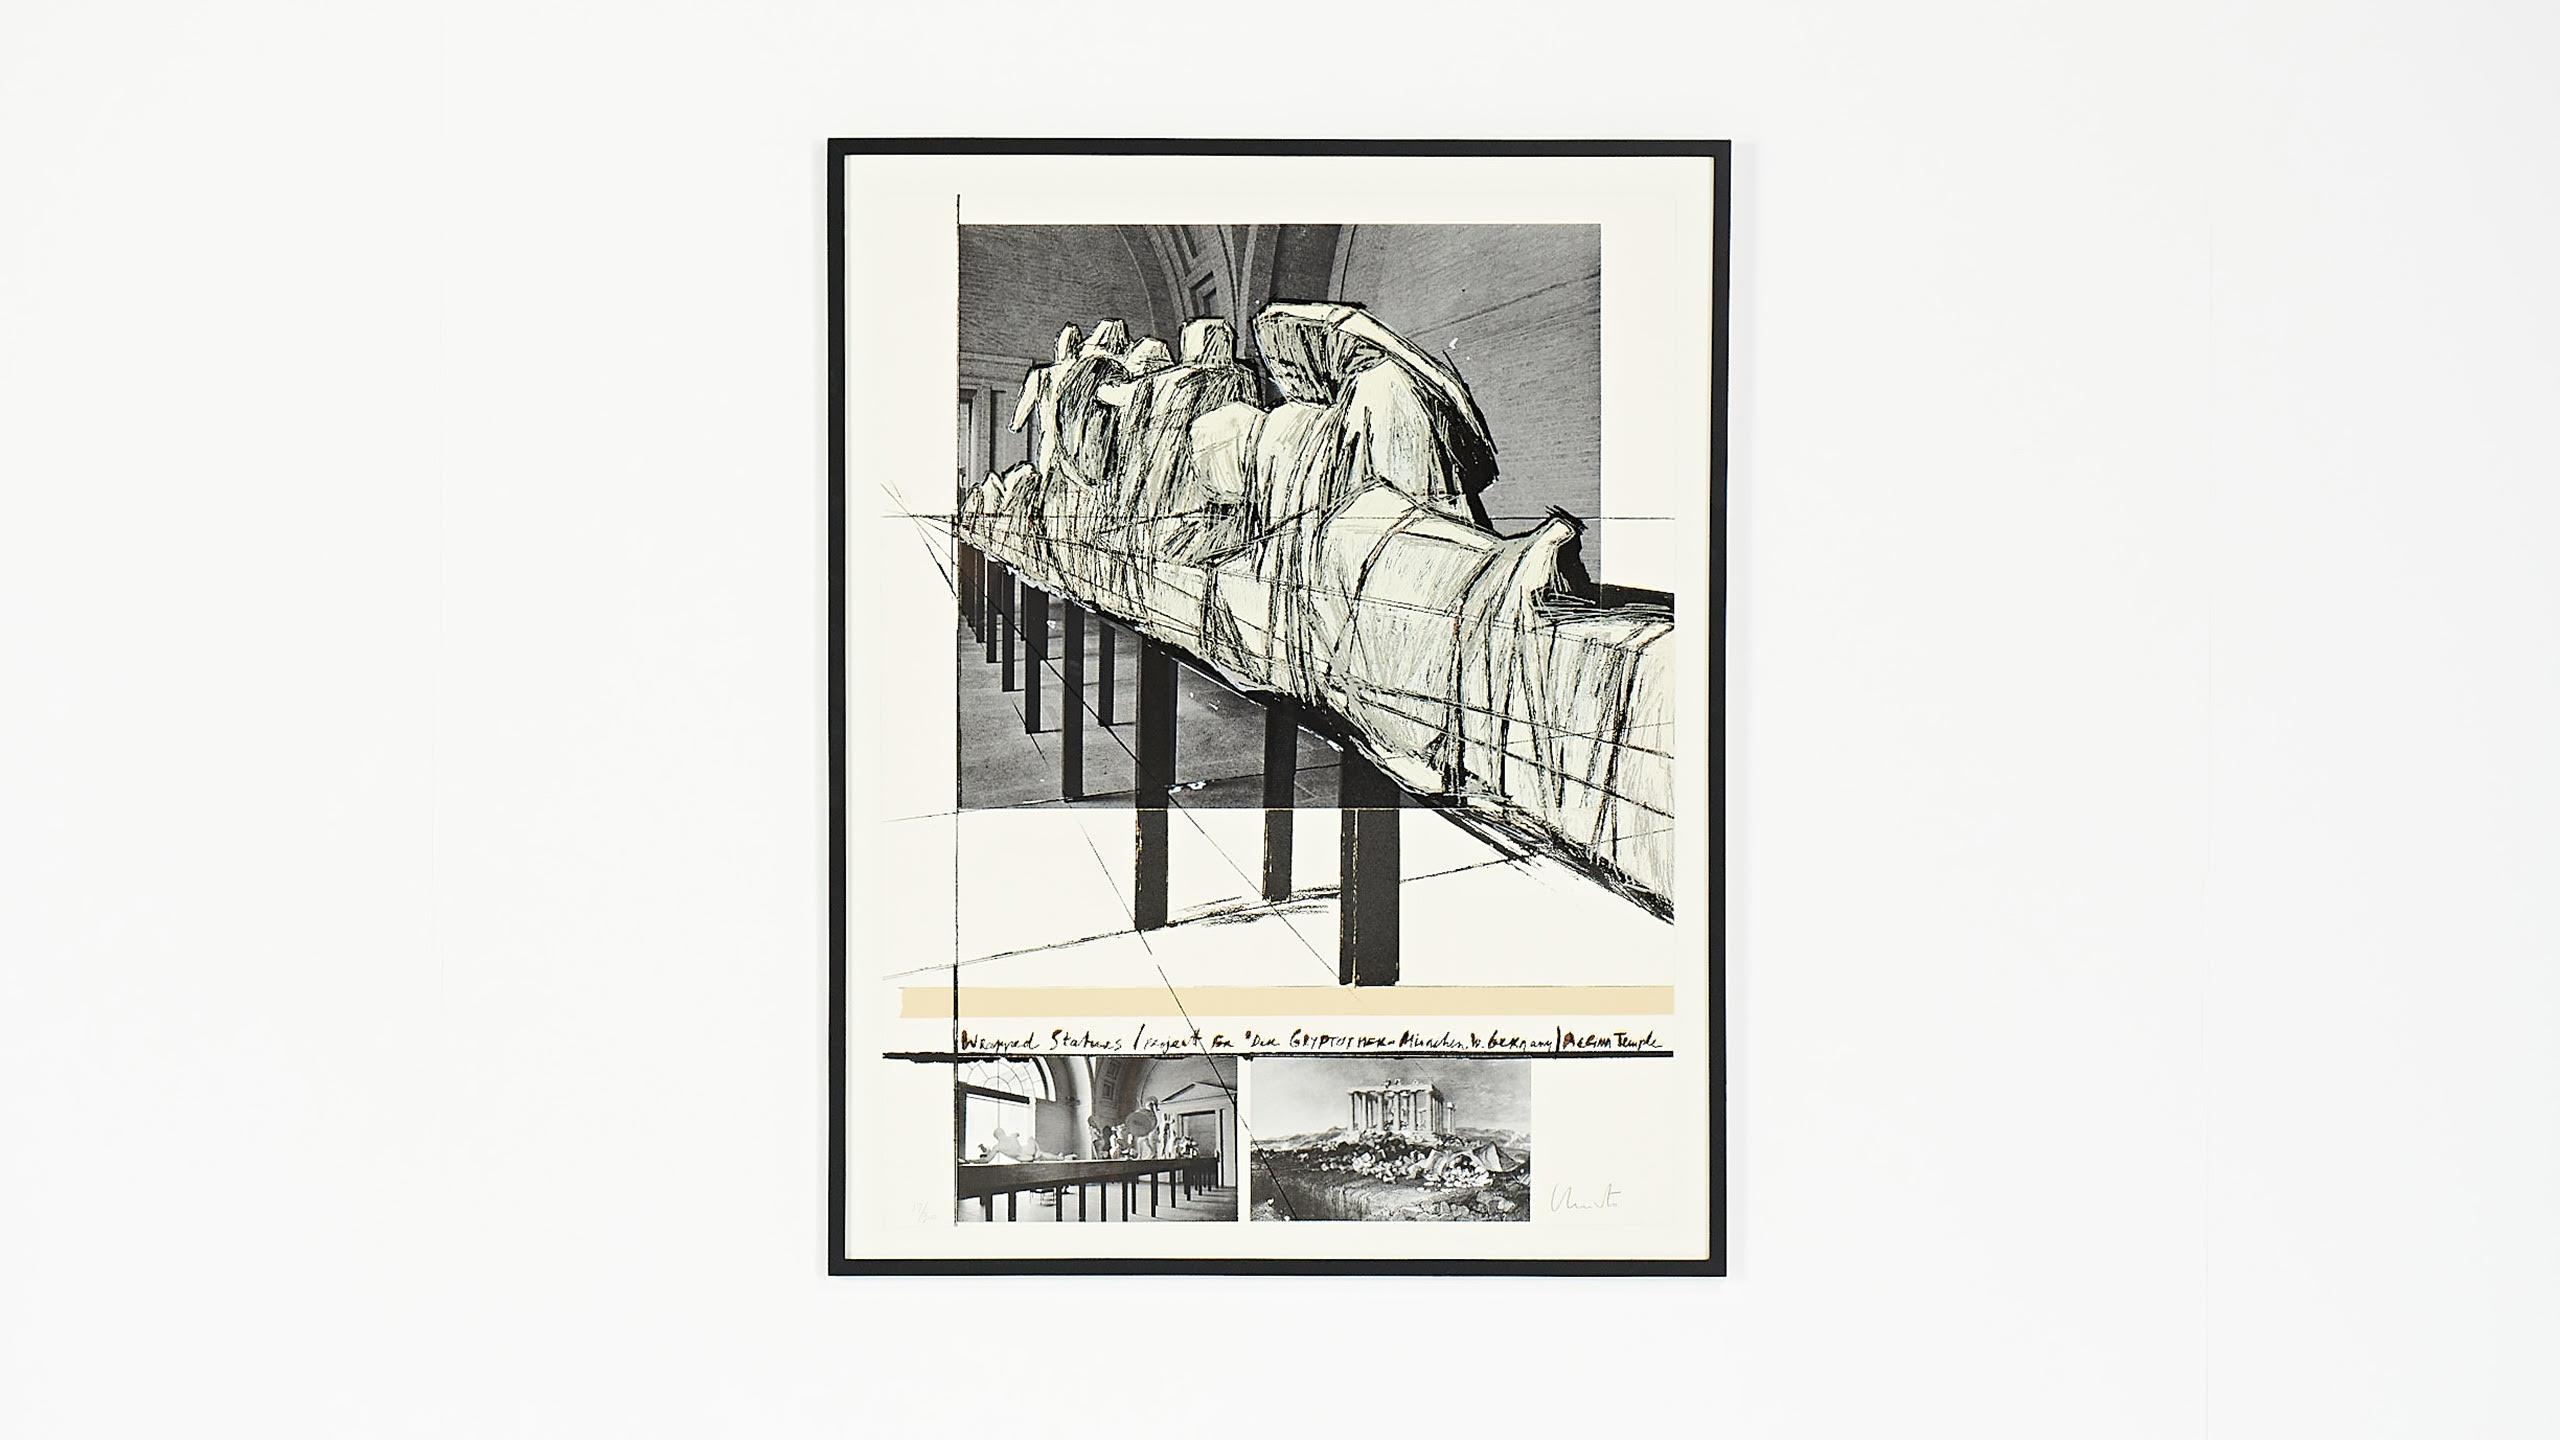 [:en]Wrapped Statues (Project for der Glypotek Munchen, W.Germany, Aegina temple) Vladimirov Javacheff christo jeanne-claude silkscreen collage[:]